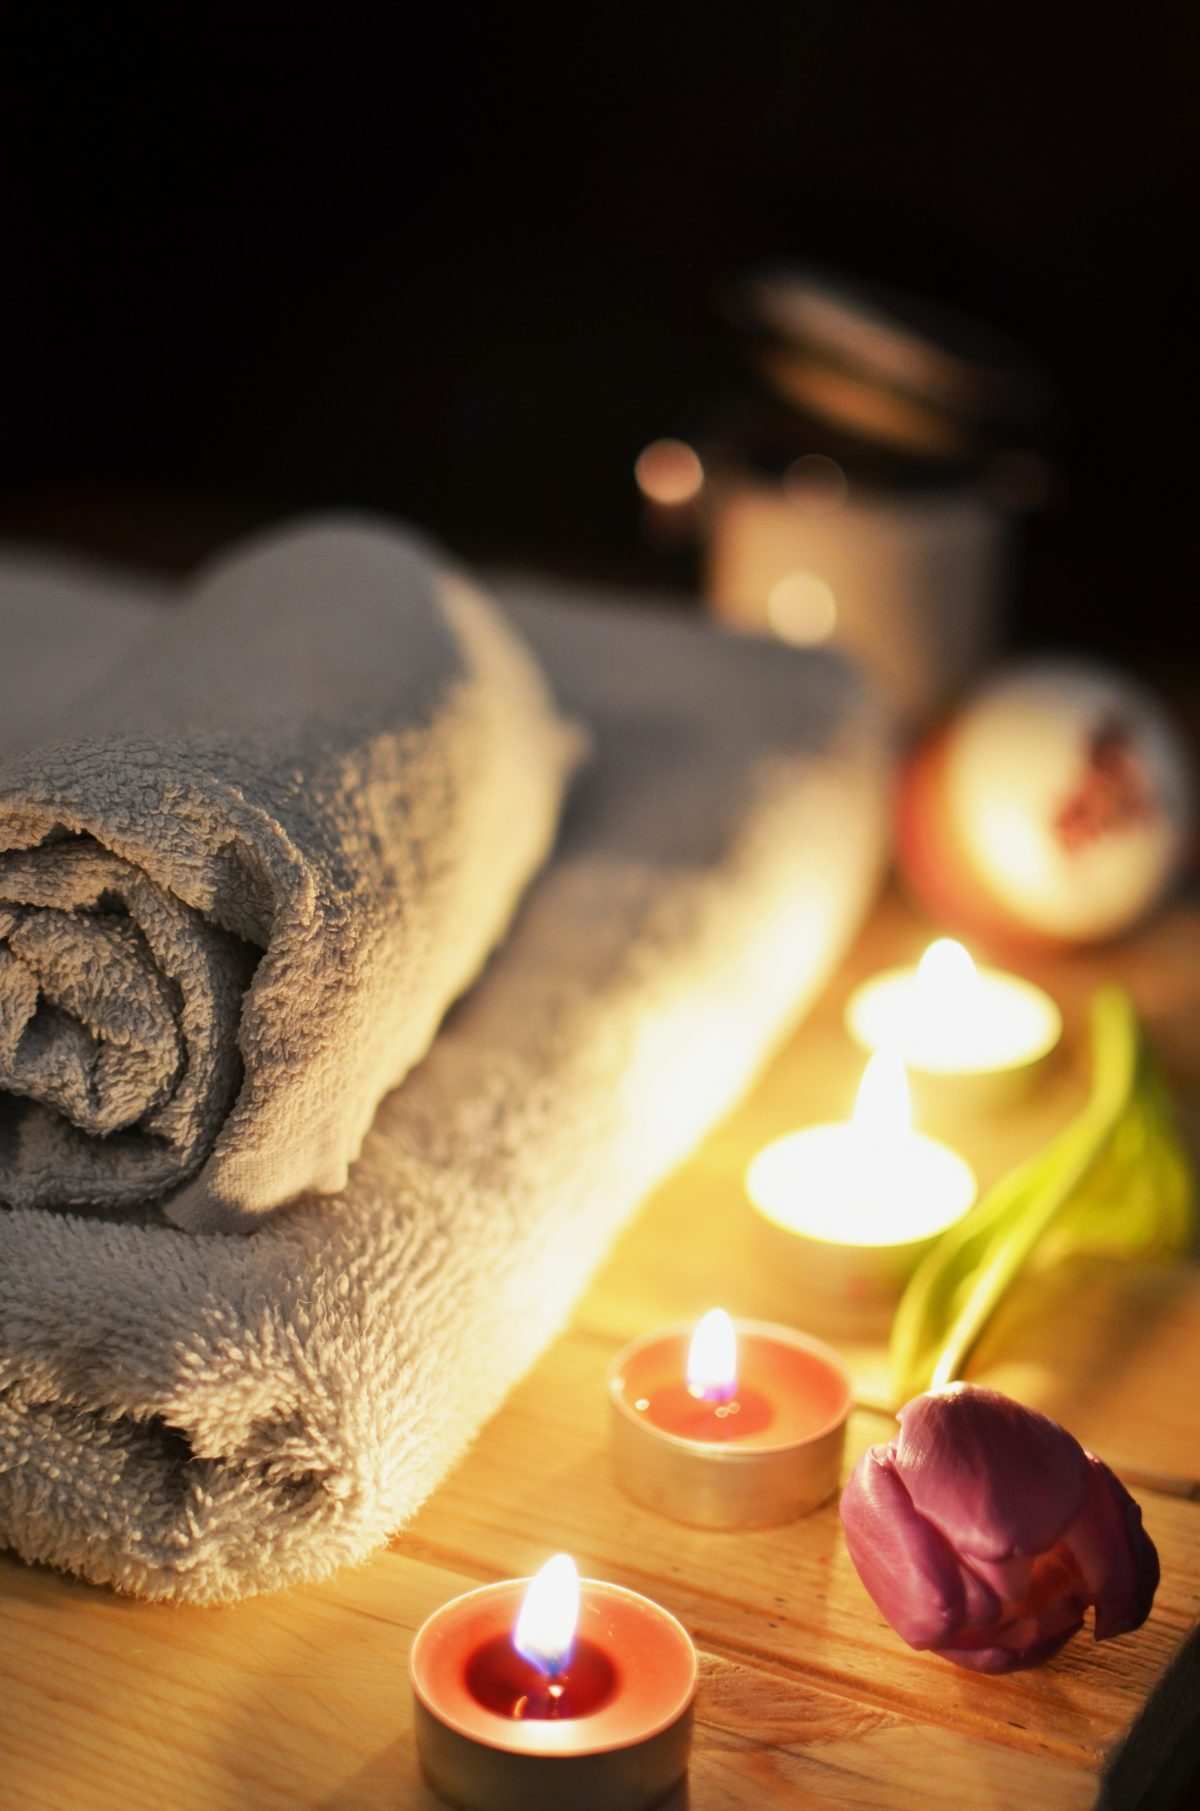 massage-therapy-spa-bg-wellness